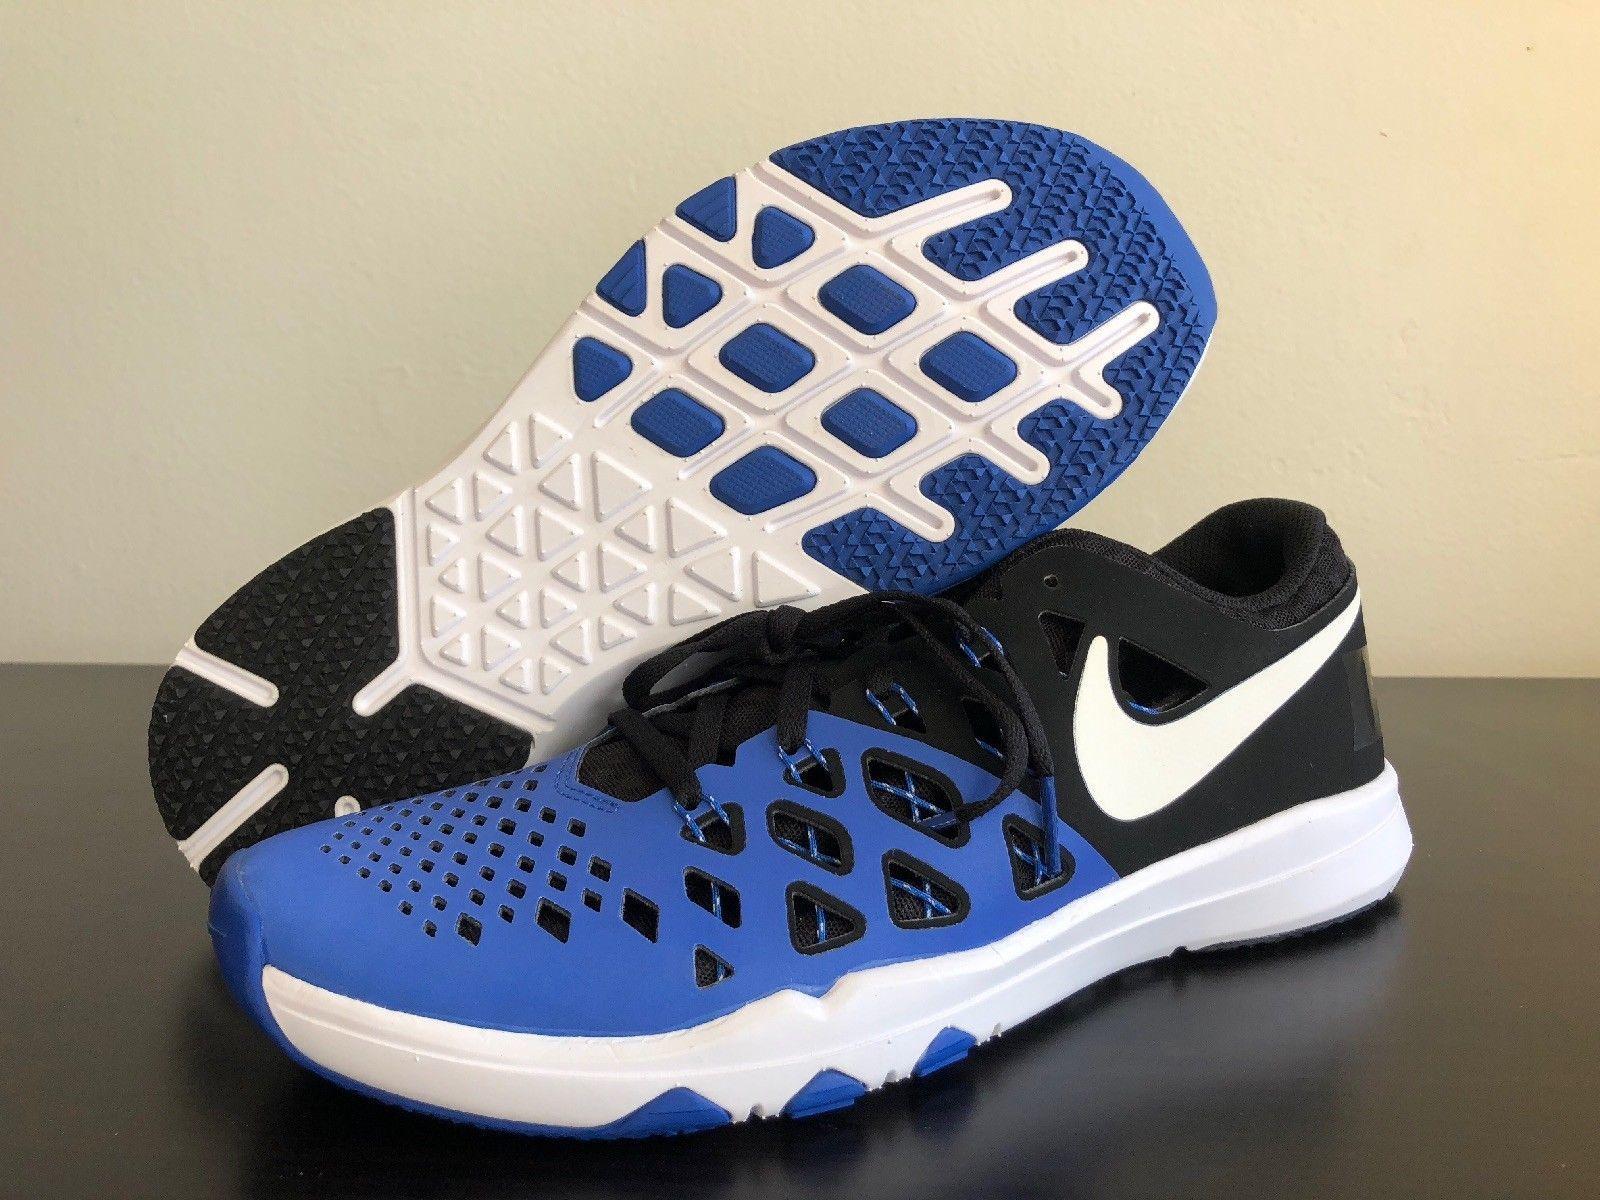 14123df22a645 S l1600. S l1600. Previous. Nike Train Speed 4 AMP 844102 410 Duke Blue  Devils 3M Reflect size ...